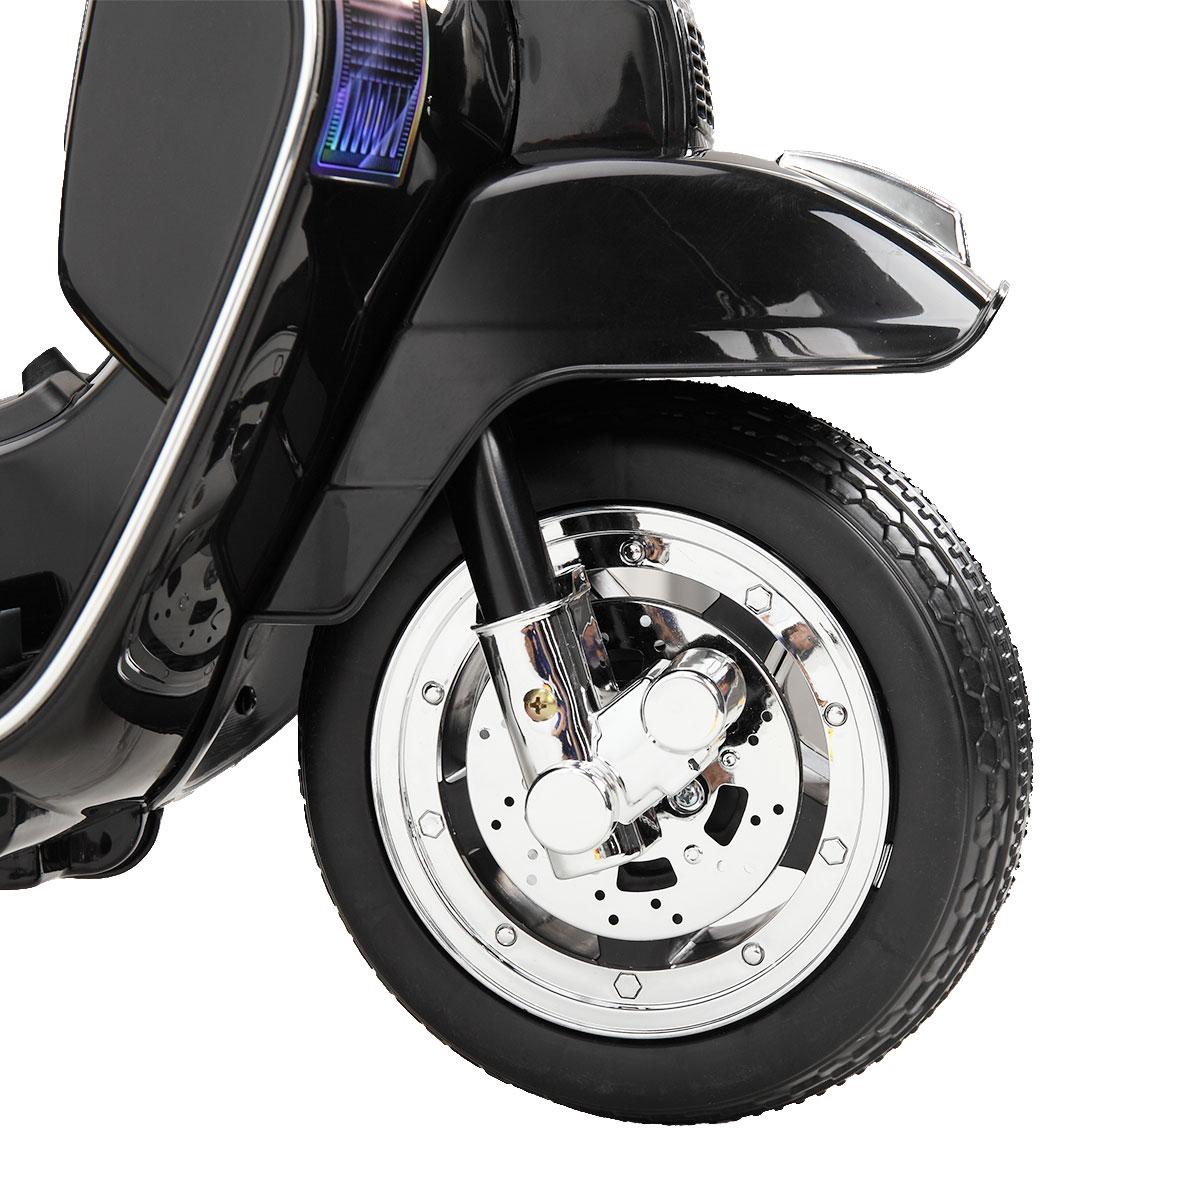 6V Electric mini Kids Motorcycle Ride On TH17U0477